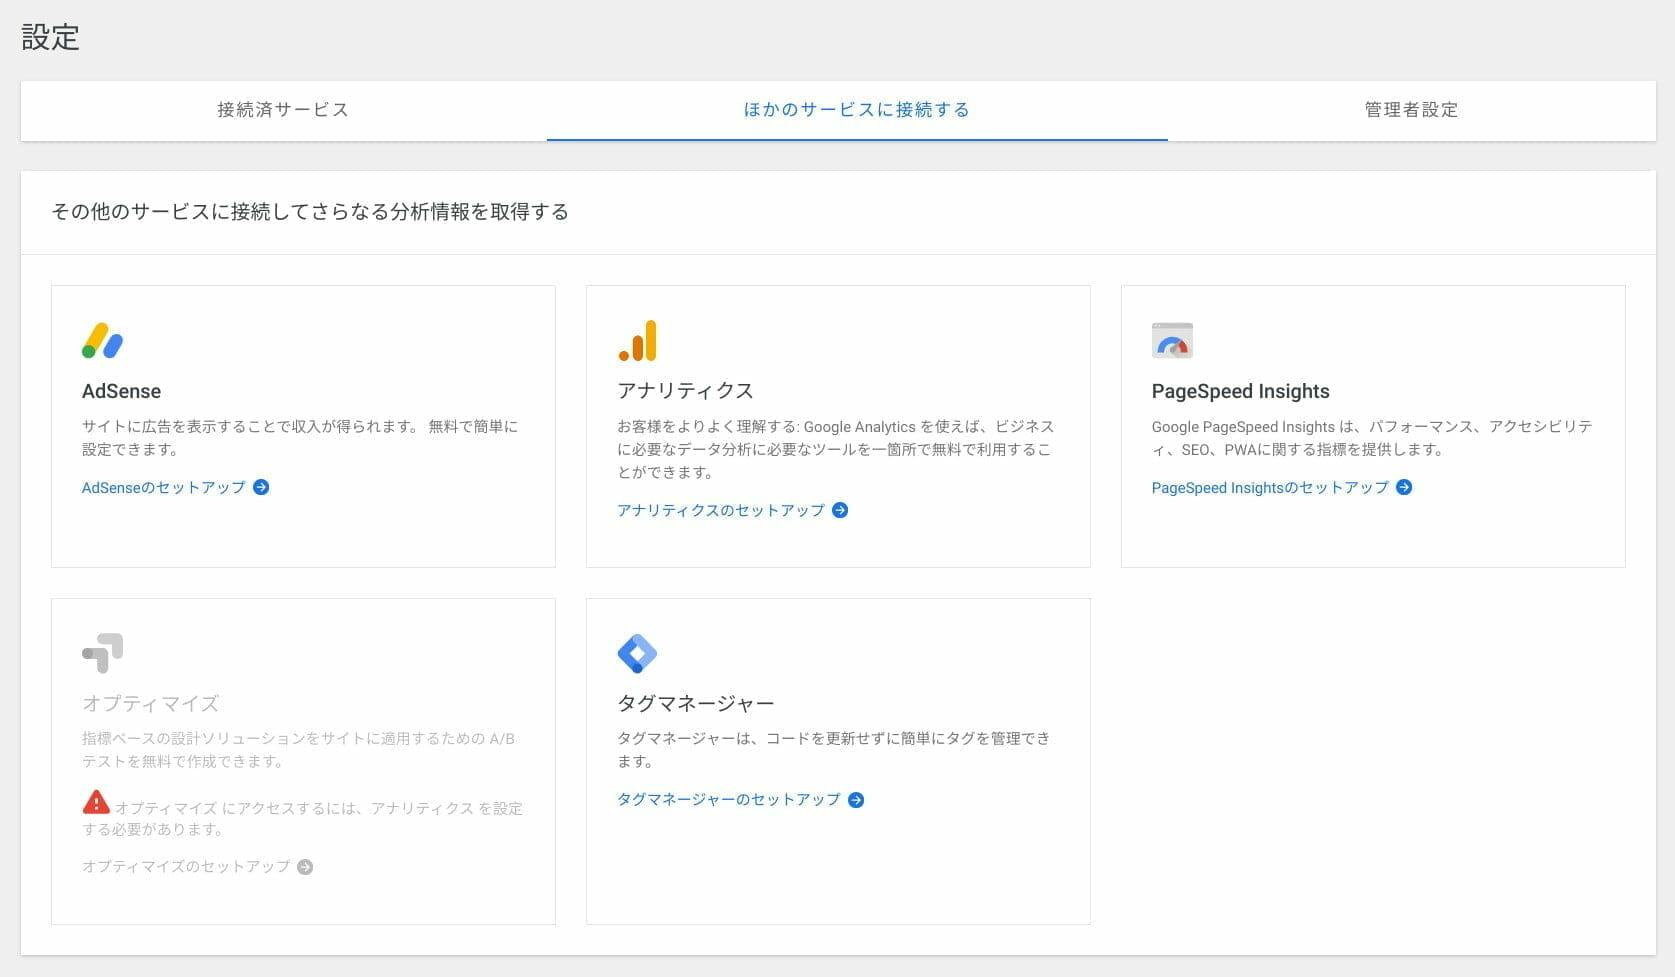 Site Kit:他の Google サービスとの連動設定を行う